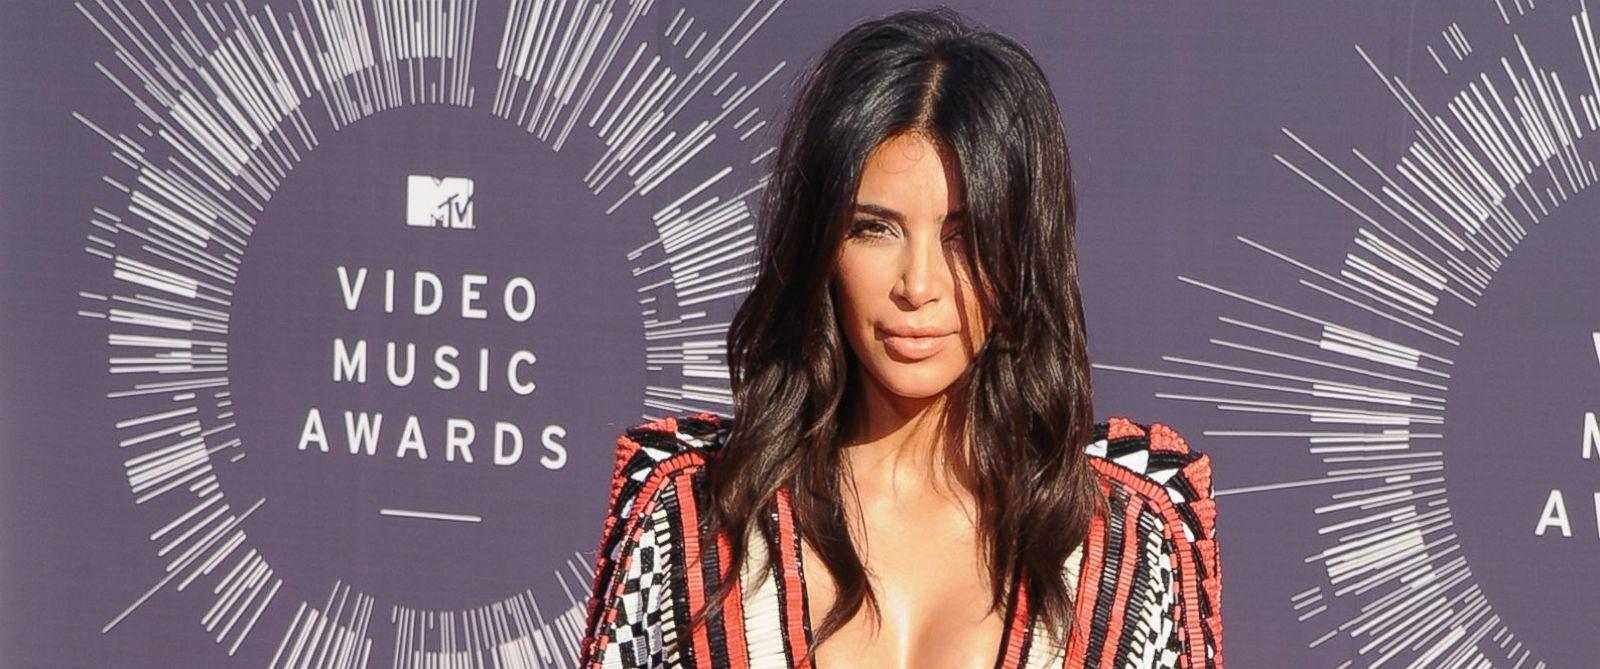 PHOTO: Kim Kardashian arrives at the 2014 MTV Video Music Awards at The Forum, Aug. 24, 2014, in Inglewood, Calif.